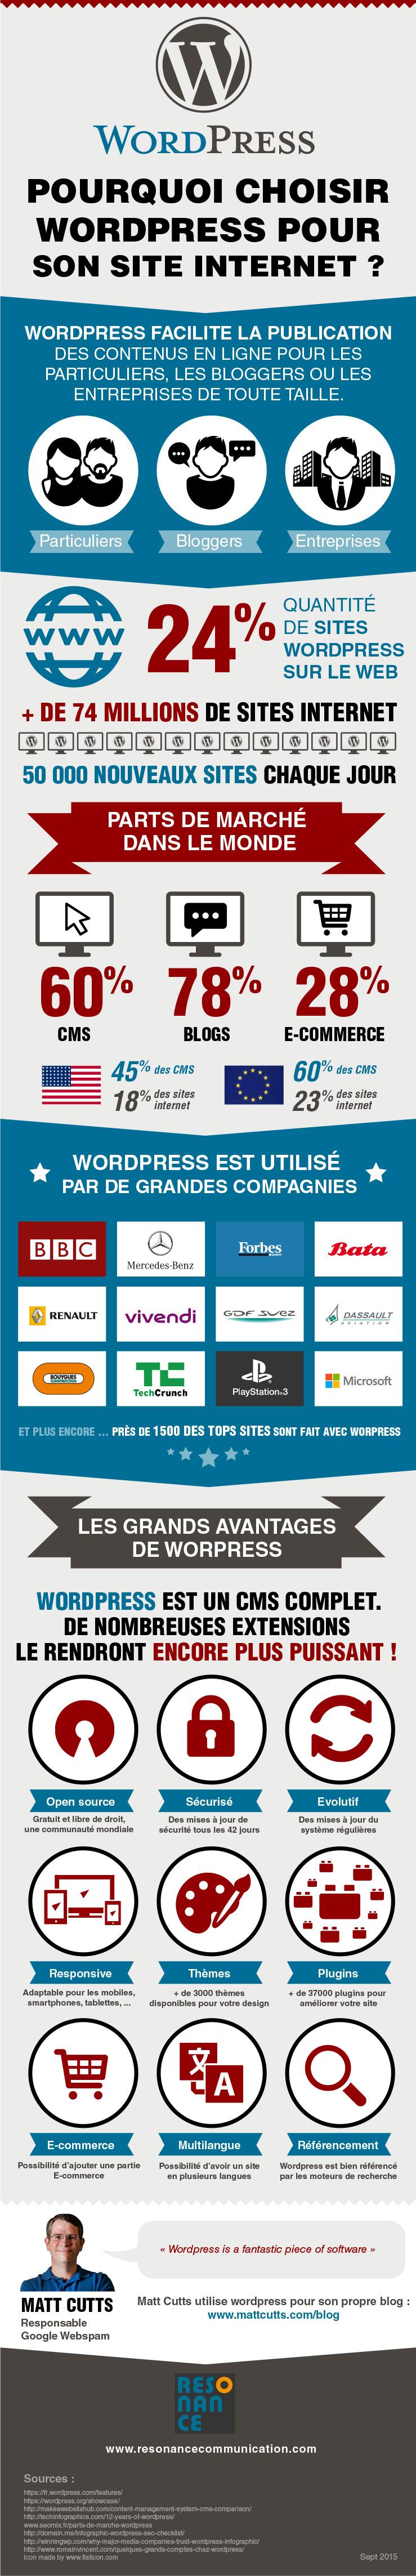 Pourquoi choisir wordpress pour son site internet ?